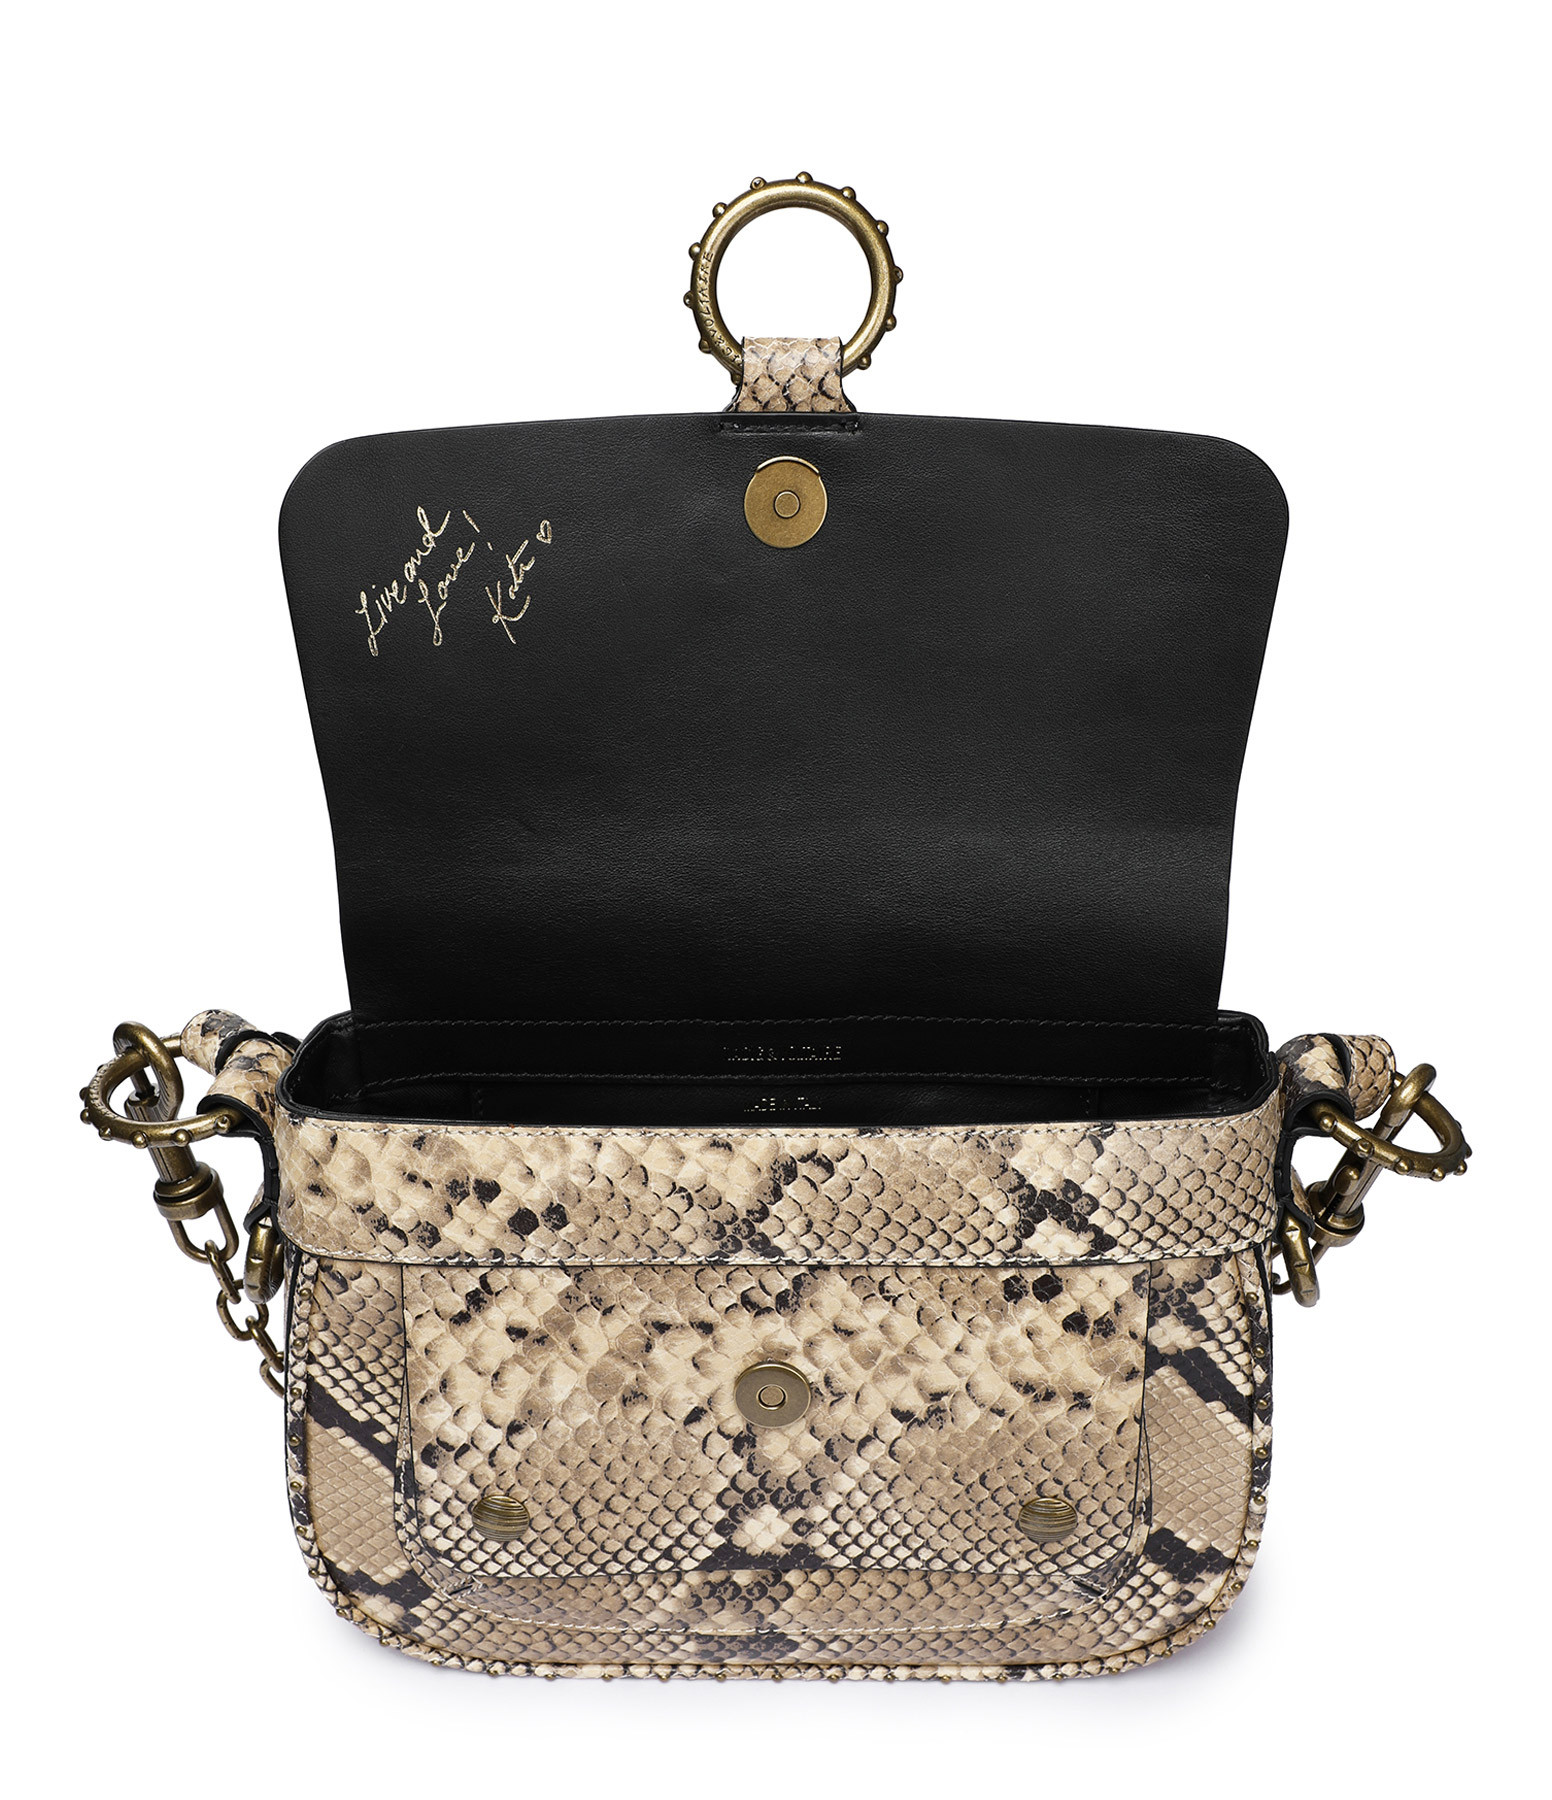 ZADIG & VOLTAIRE - Sac Wild Cuir Python Desert, Collection Kate Moss